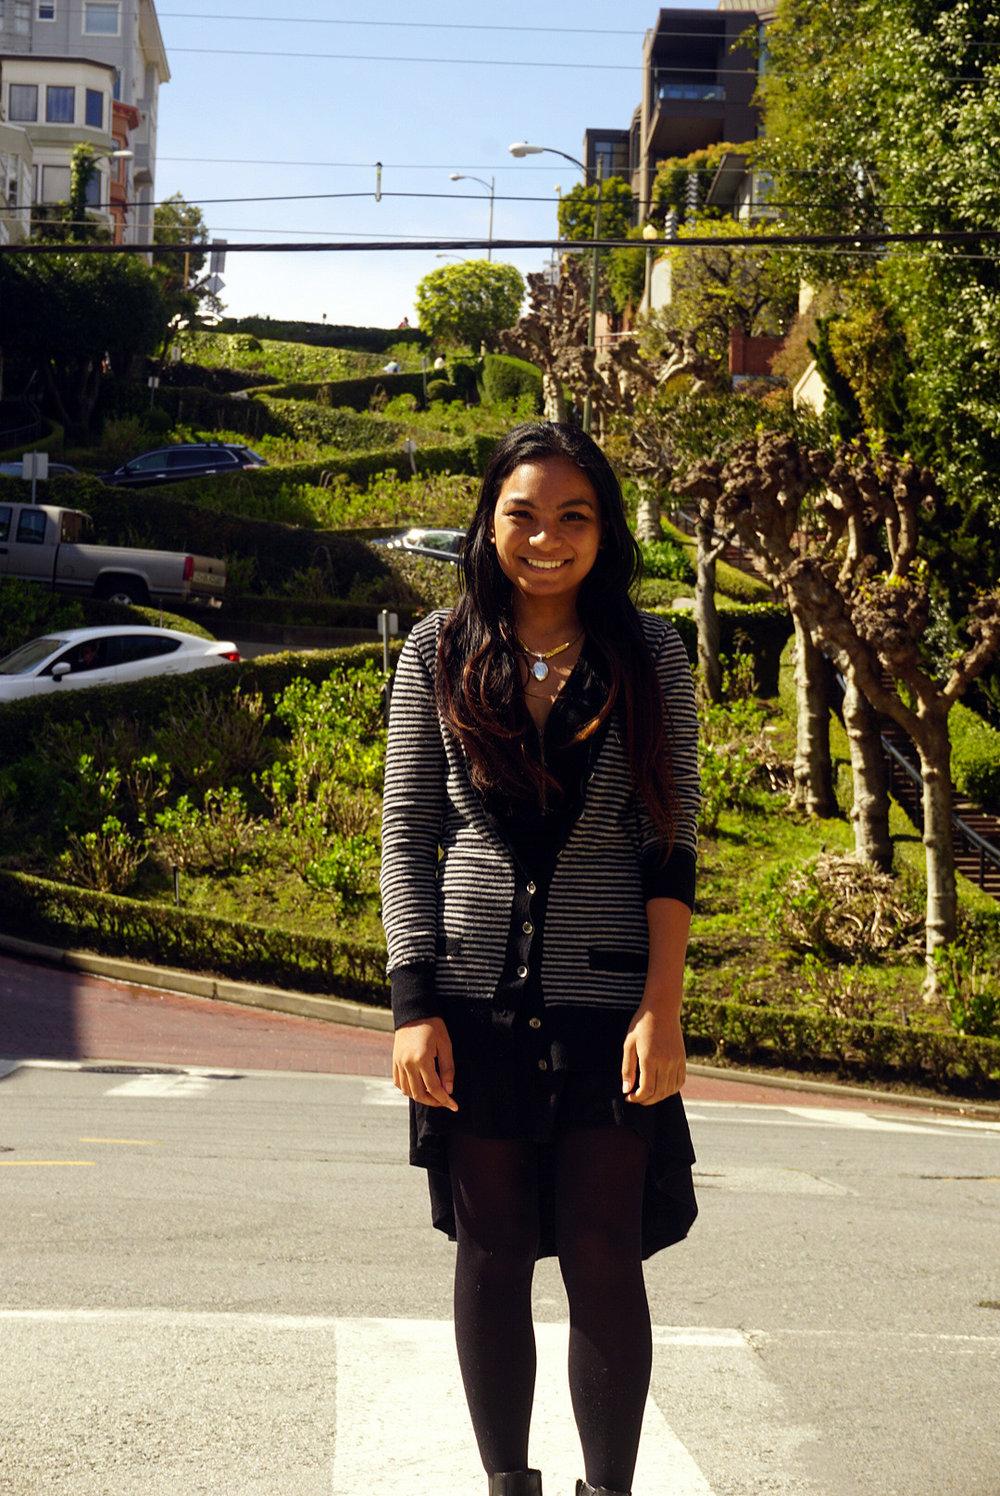 Zipper-Dresses-Striped-Cardigans-High-Low-Dress-Fashionista-Blogger-Style-LINDATENCHITRAN-3-1080x1616.jpg